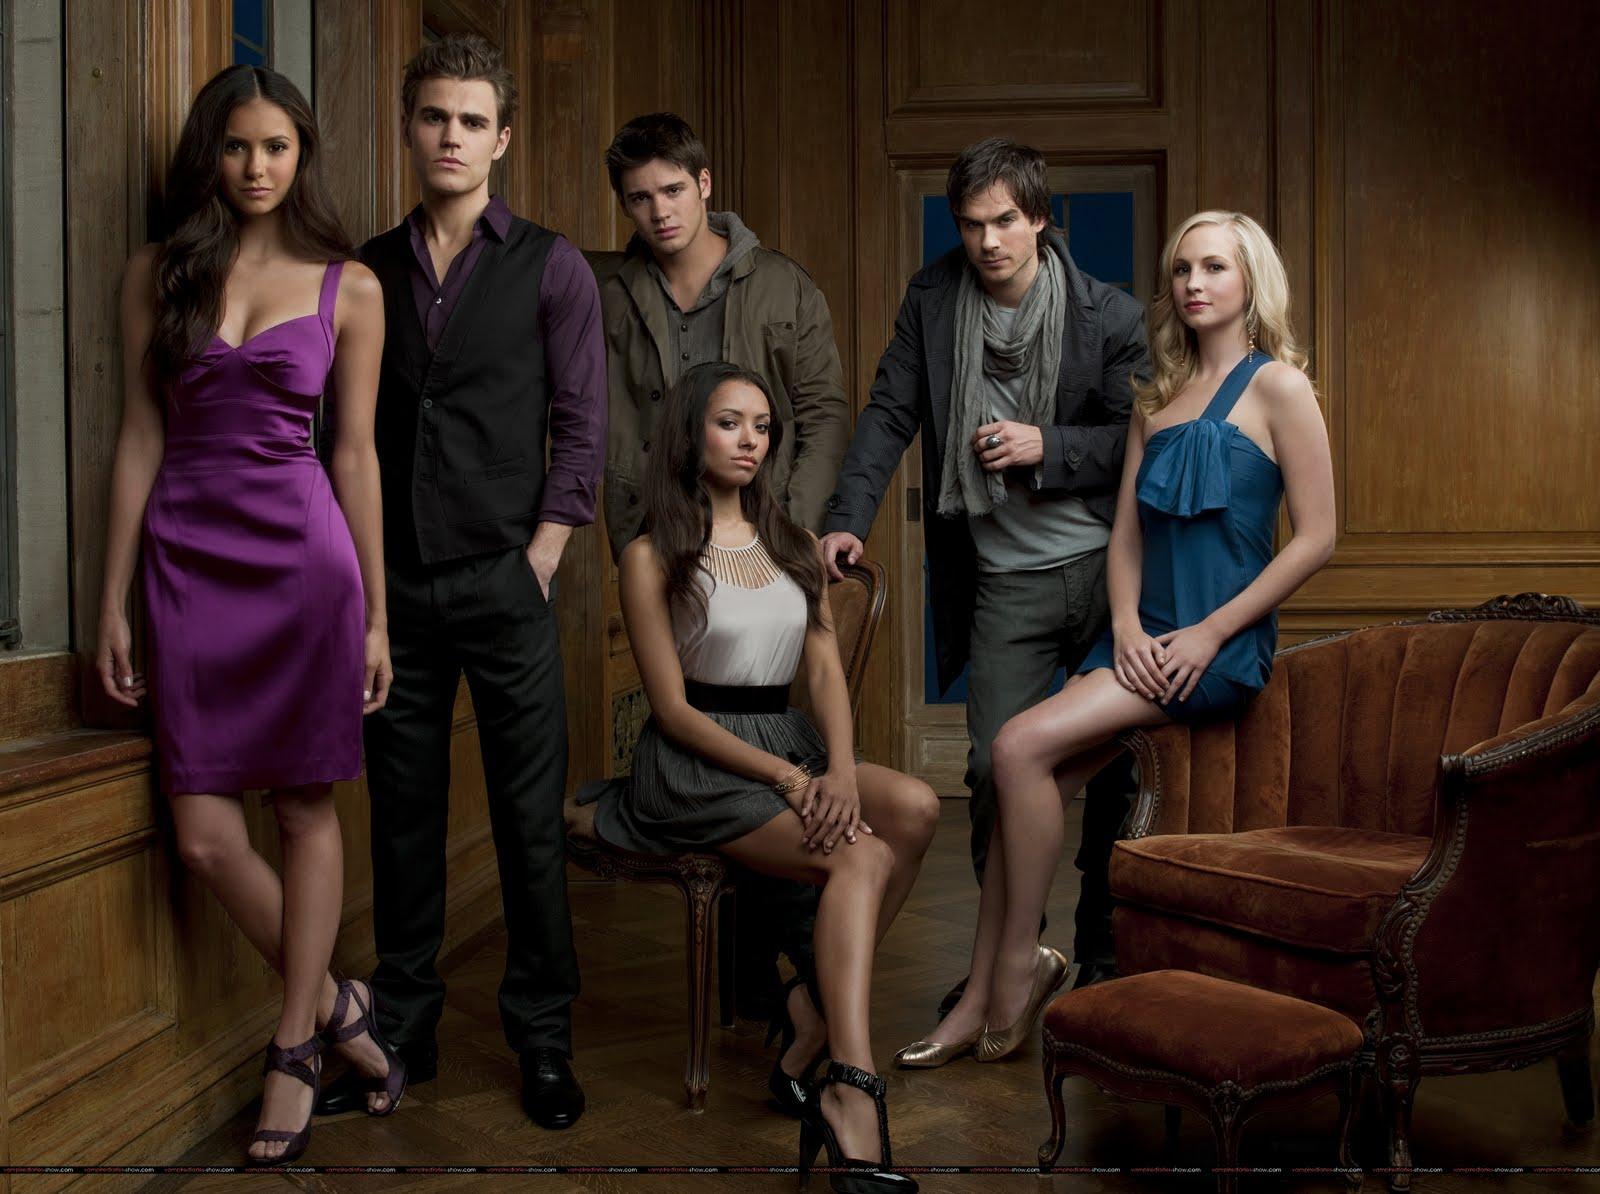 *Especial - Séries Sobre vampiros. The-vampire-diaries-1c2b0temporada-promo-2